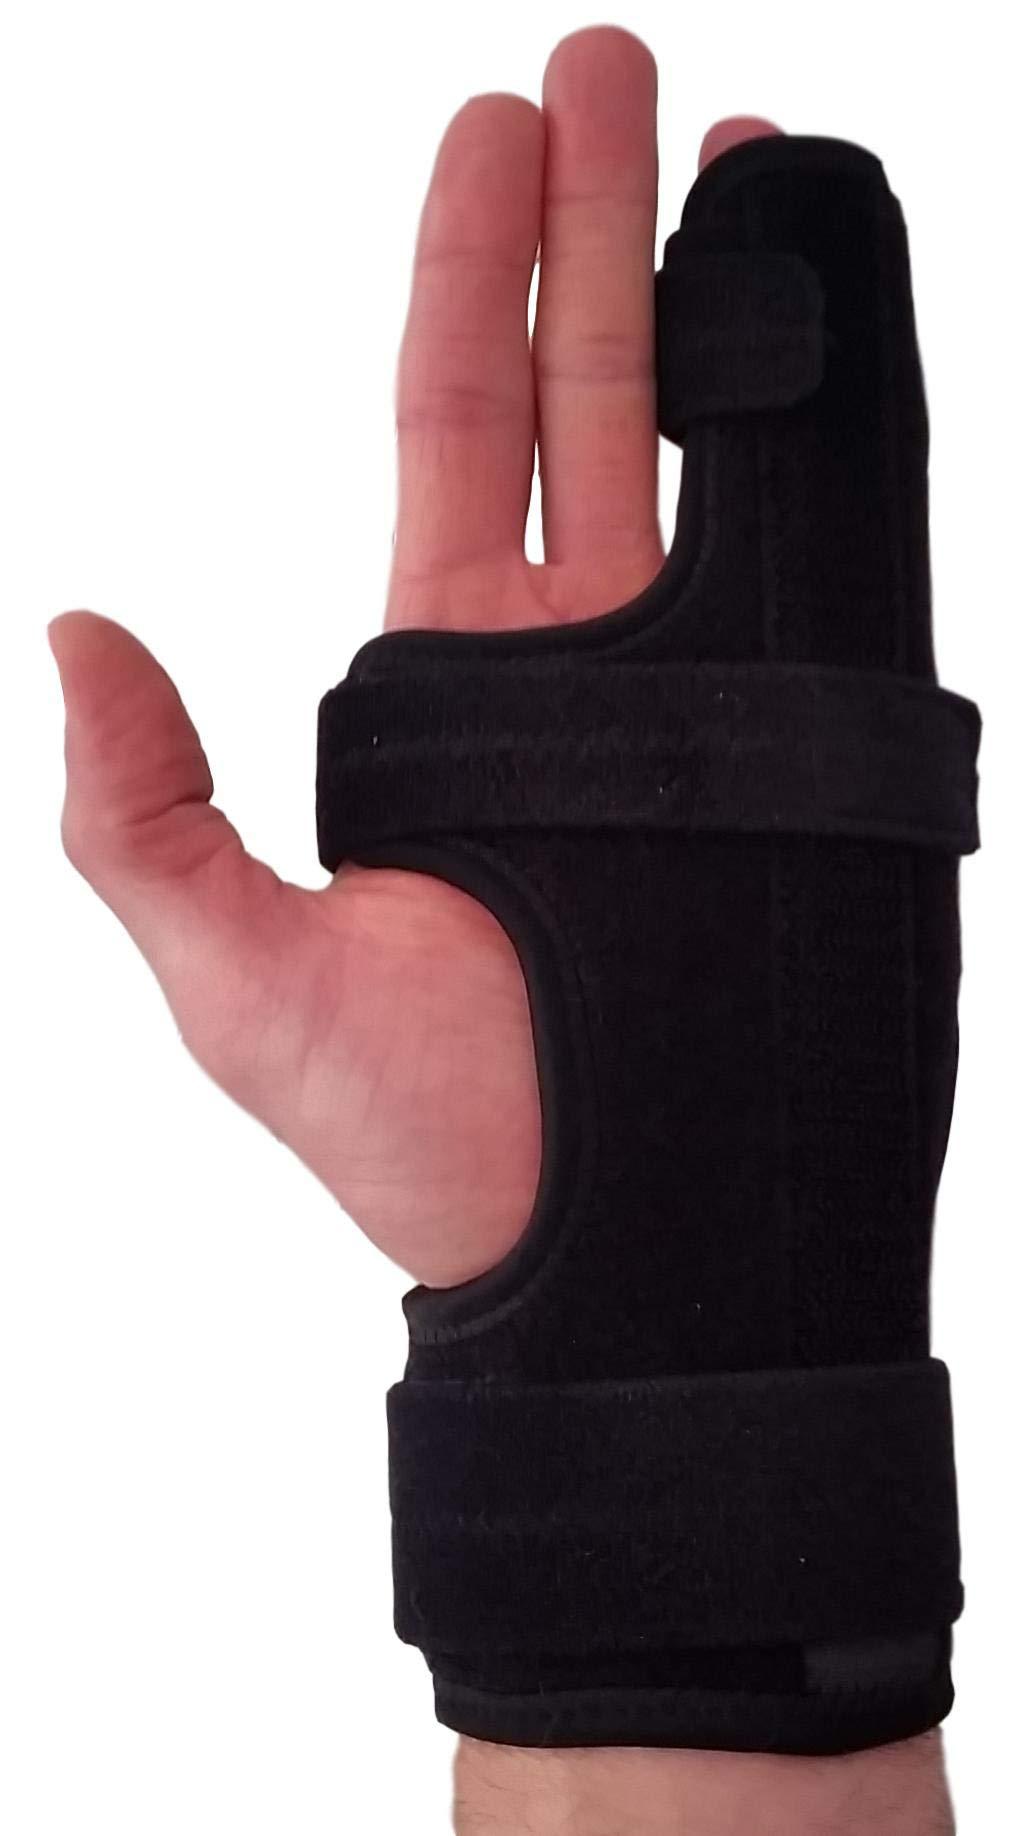 Metacarpal Finger Splint Hand Brace - Hand Brace & Metacarpal Support for Broken Fingers, Wrist & Hand Injuries or Little Finger Fracture (Left - Small/Med)